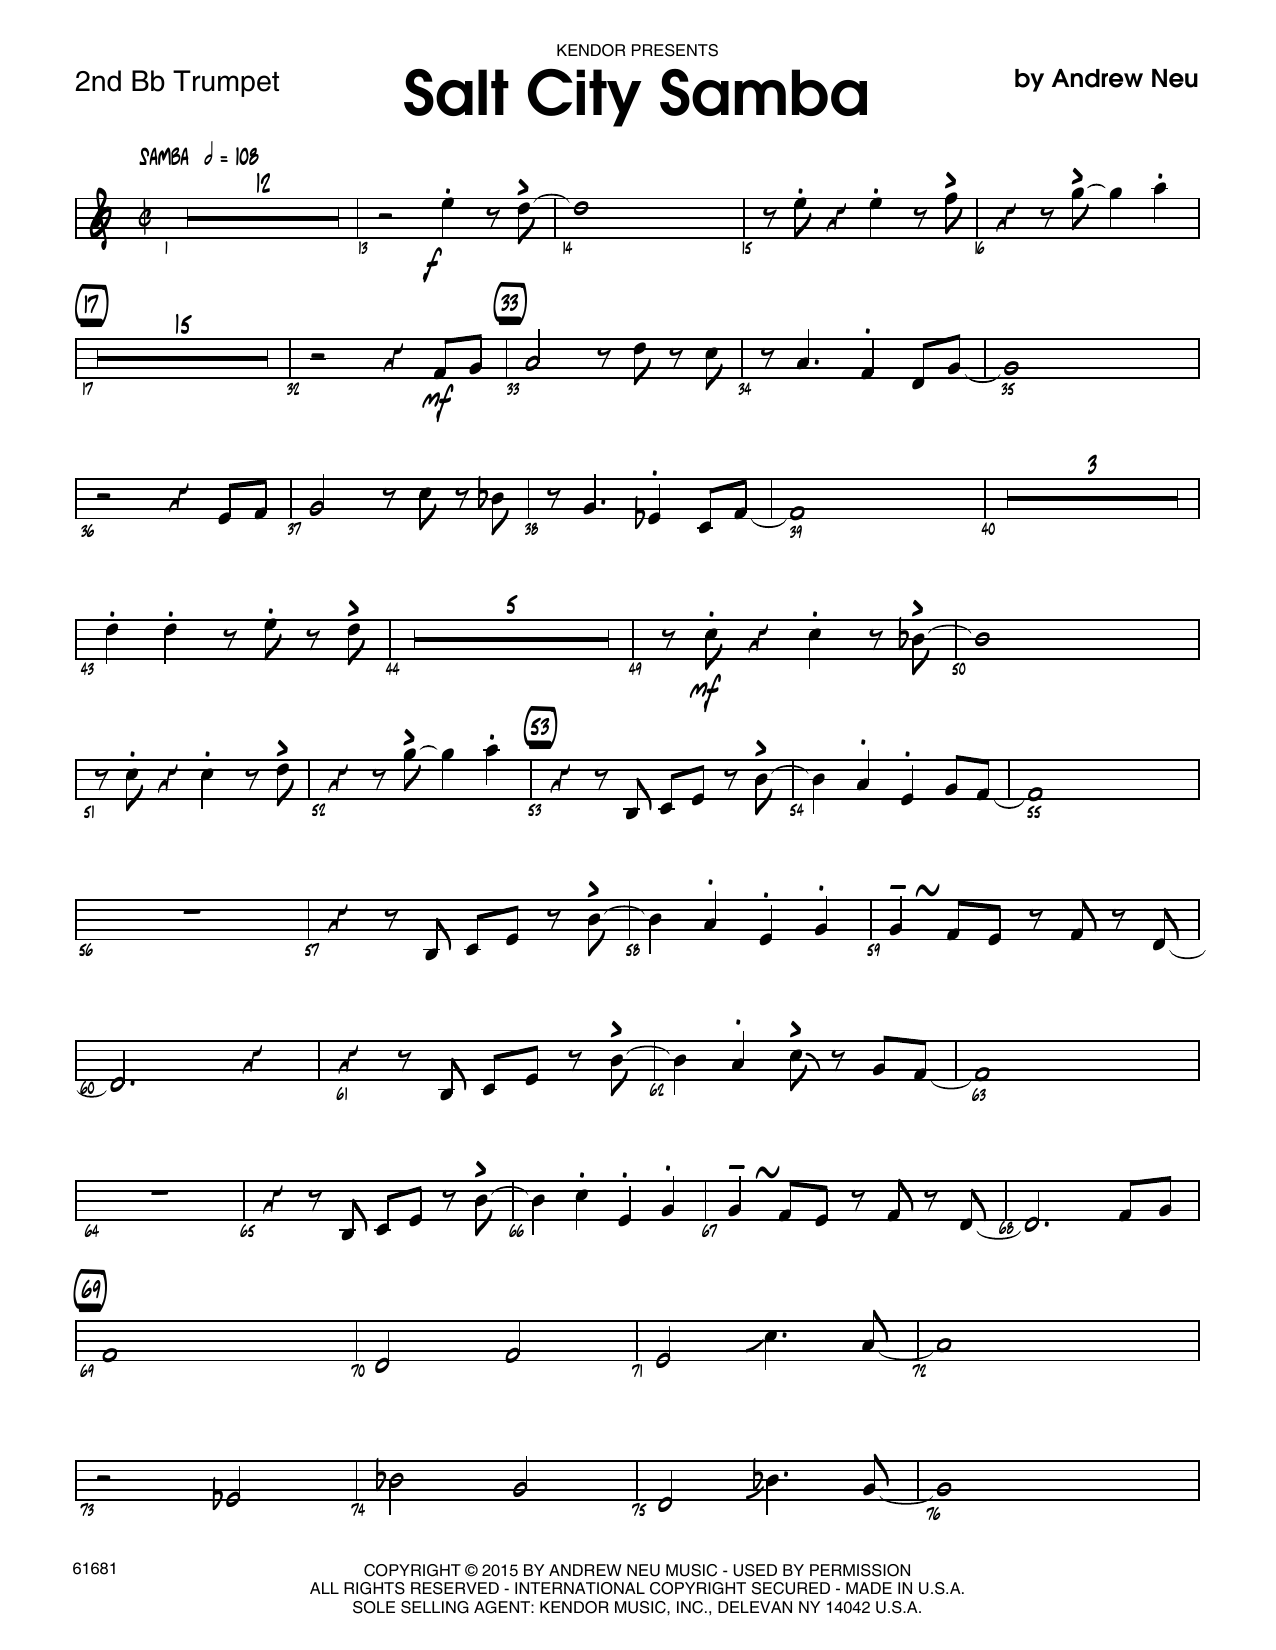 Salt City Samba - 2nd Bb Trumpet